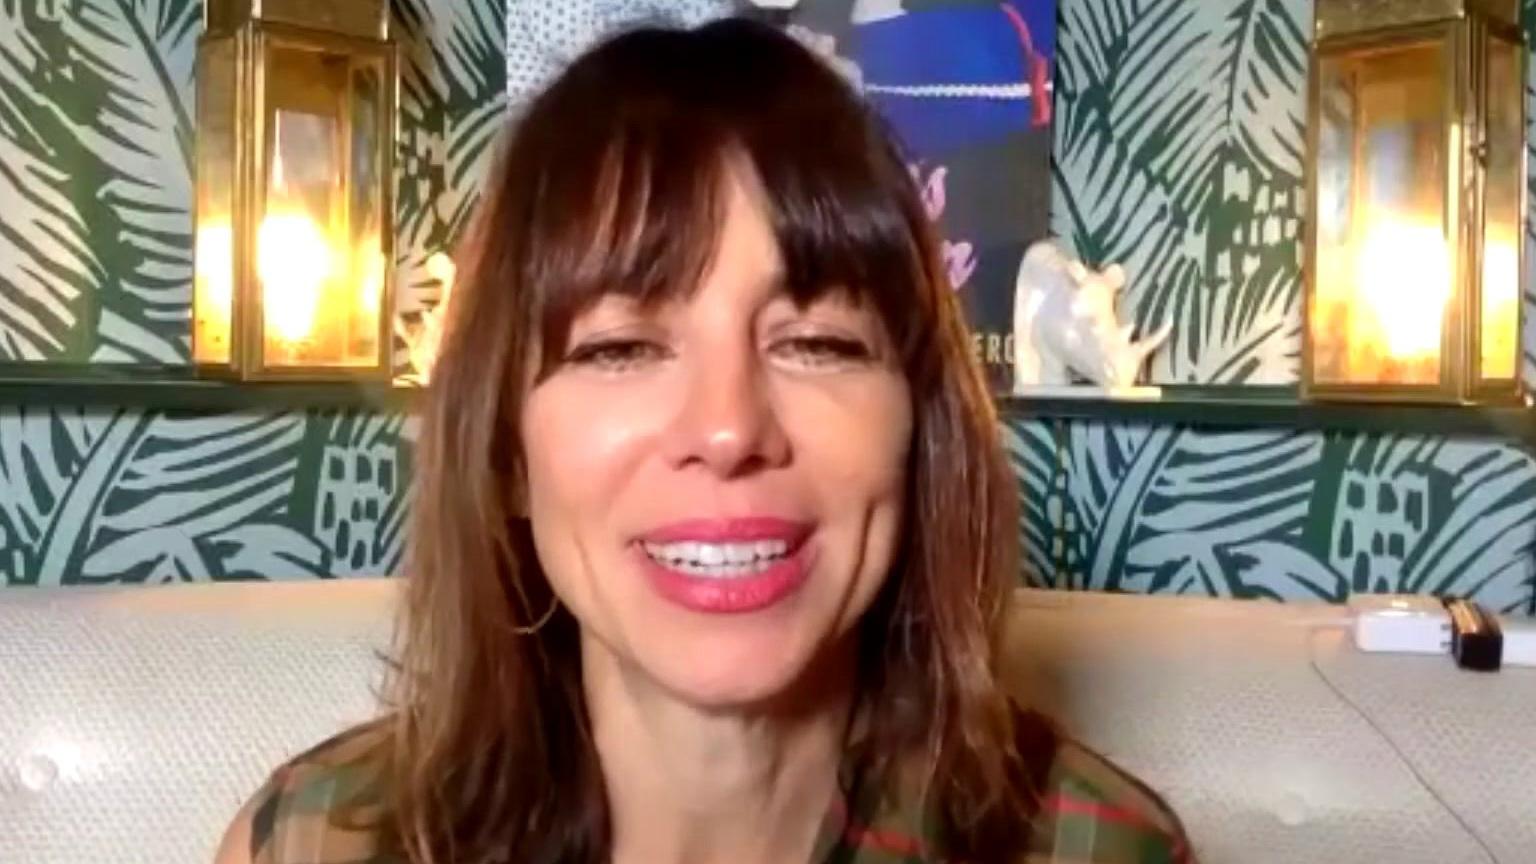 Tournament Of Laughs: Natasha Leggero's Mushroom Advice